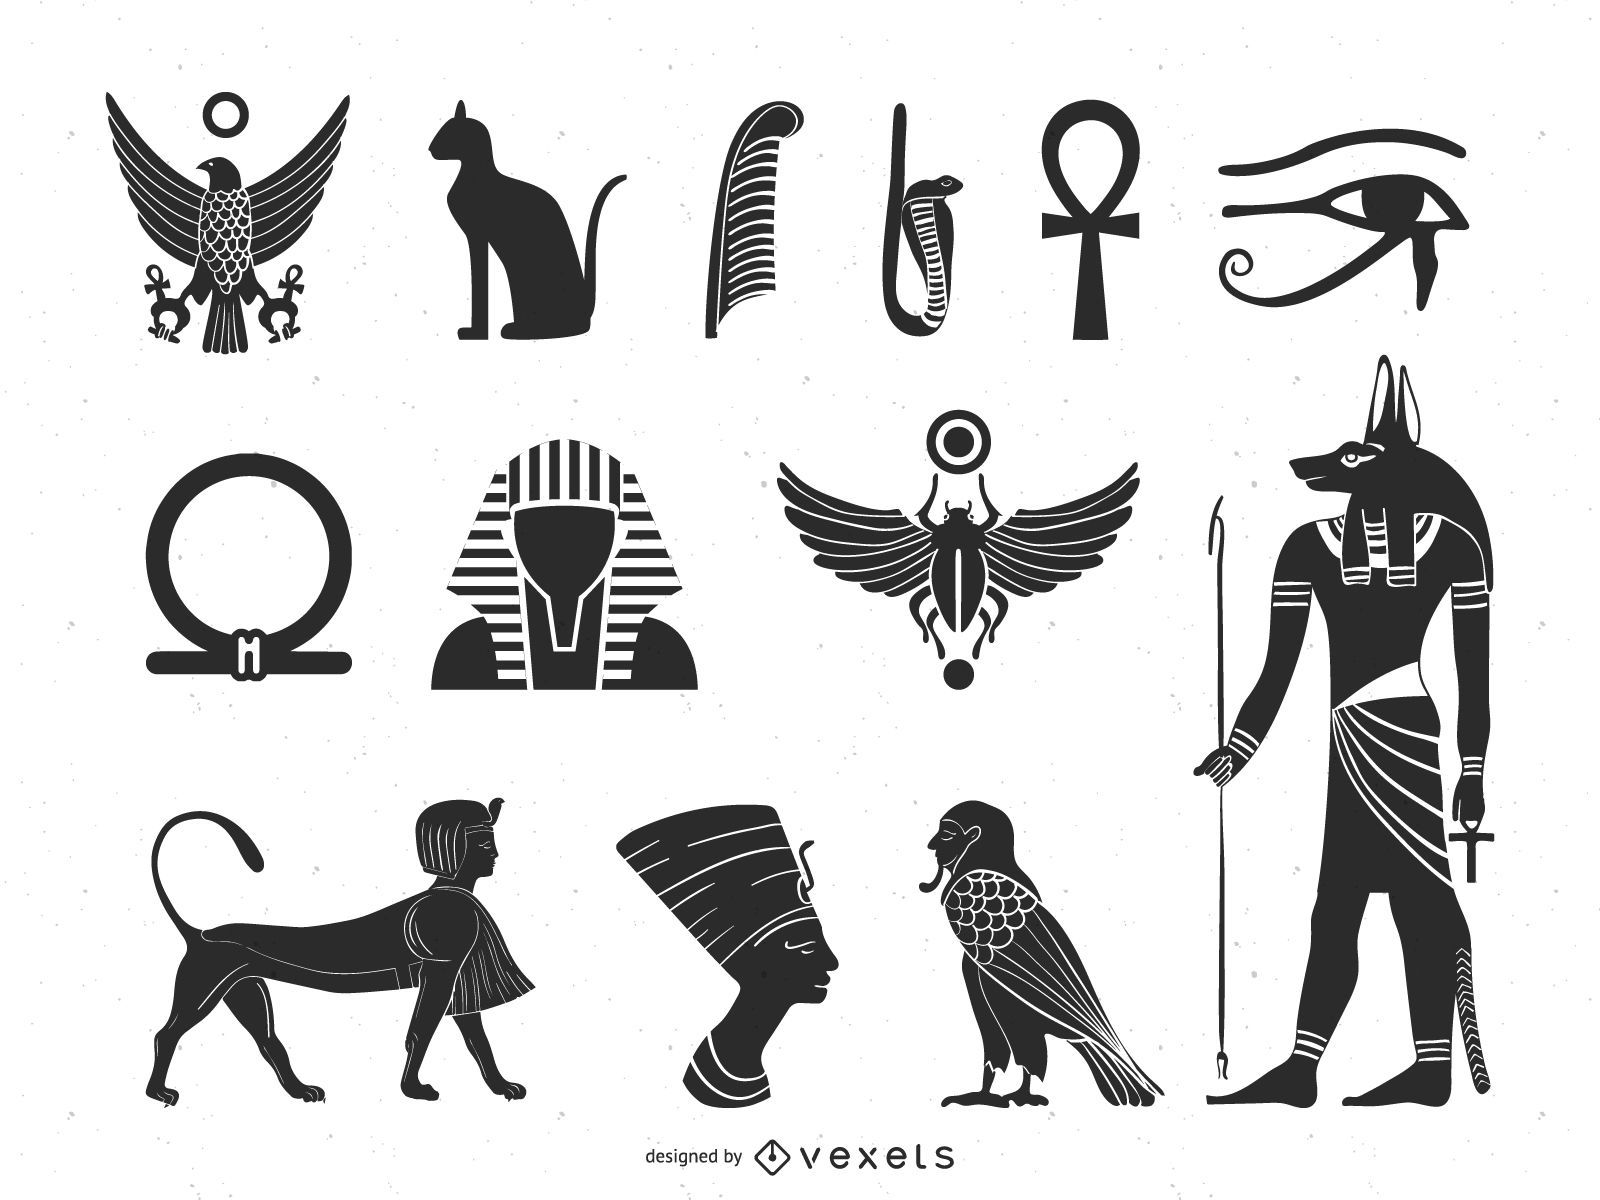 Paquete de elementos de la cultura antigua egipcia